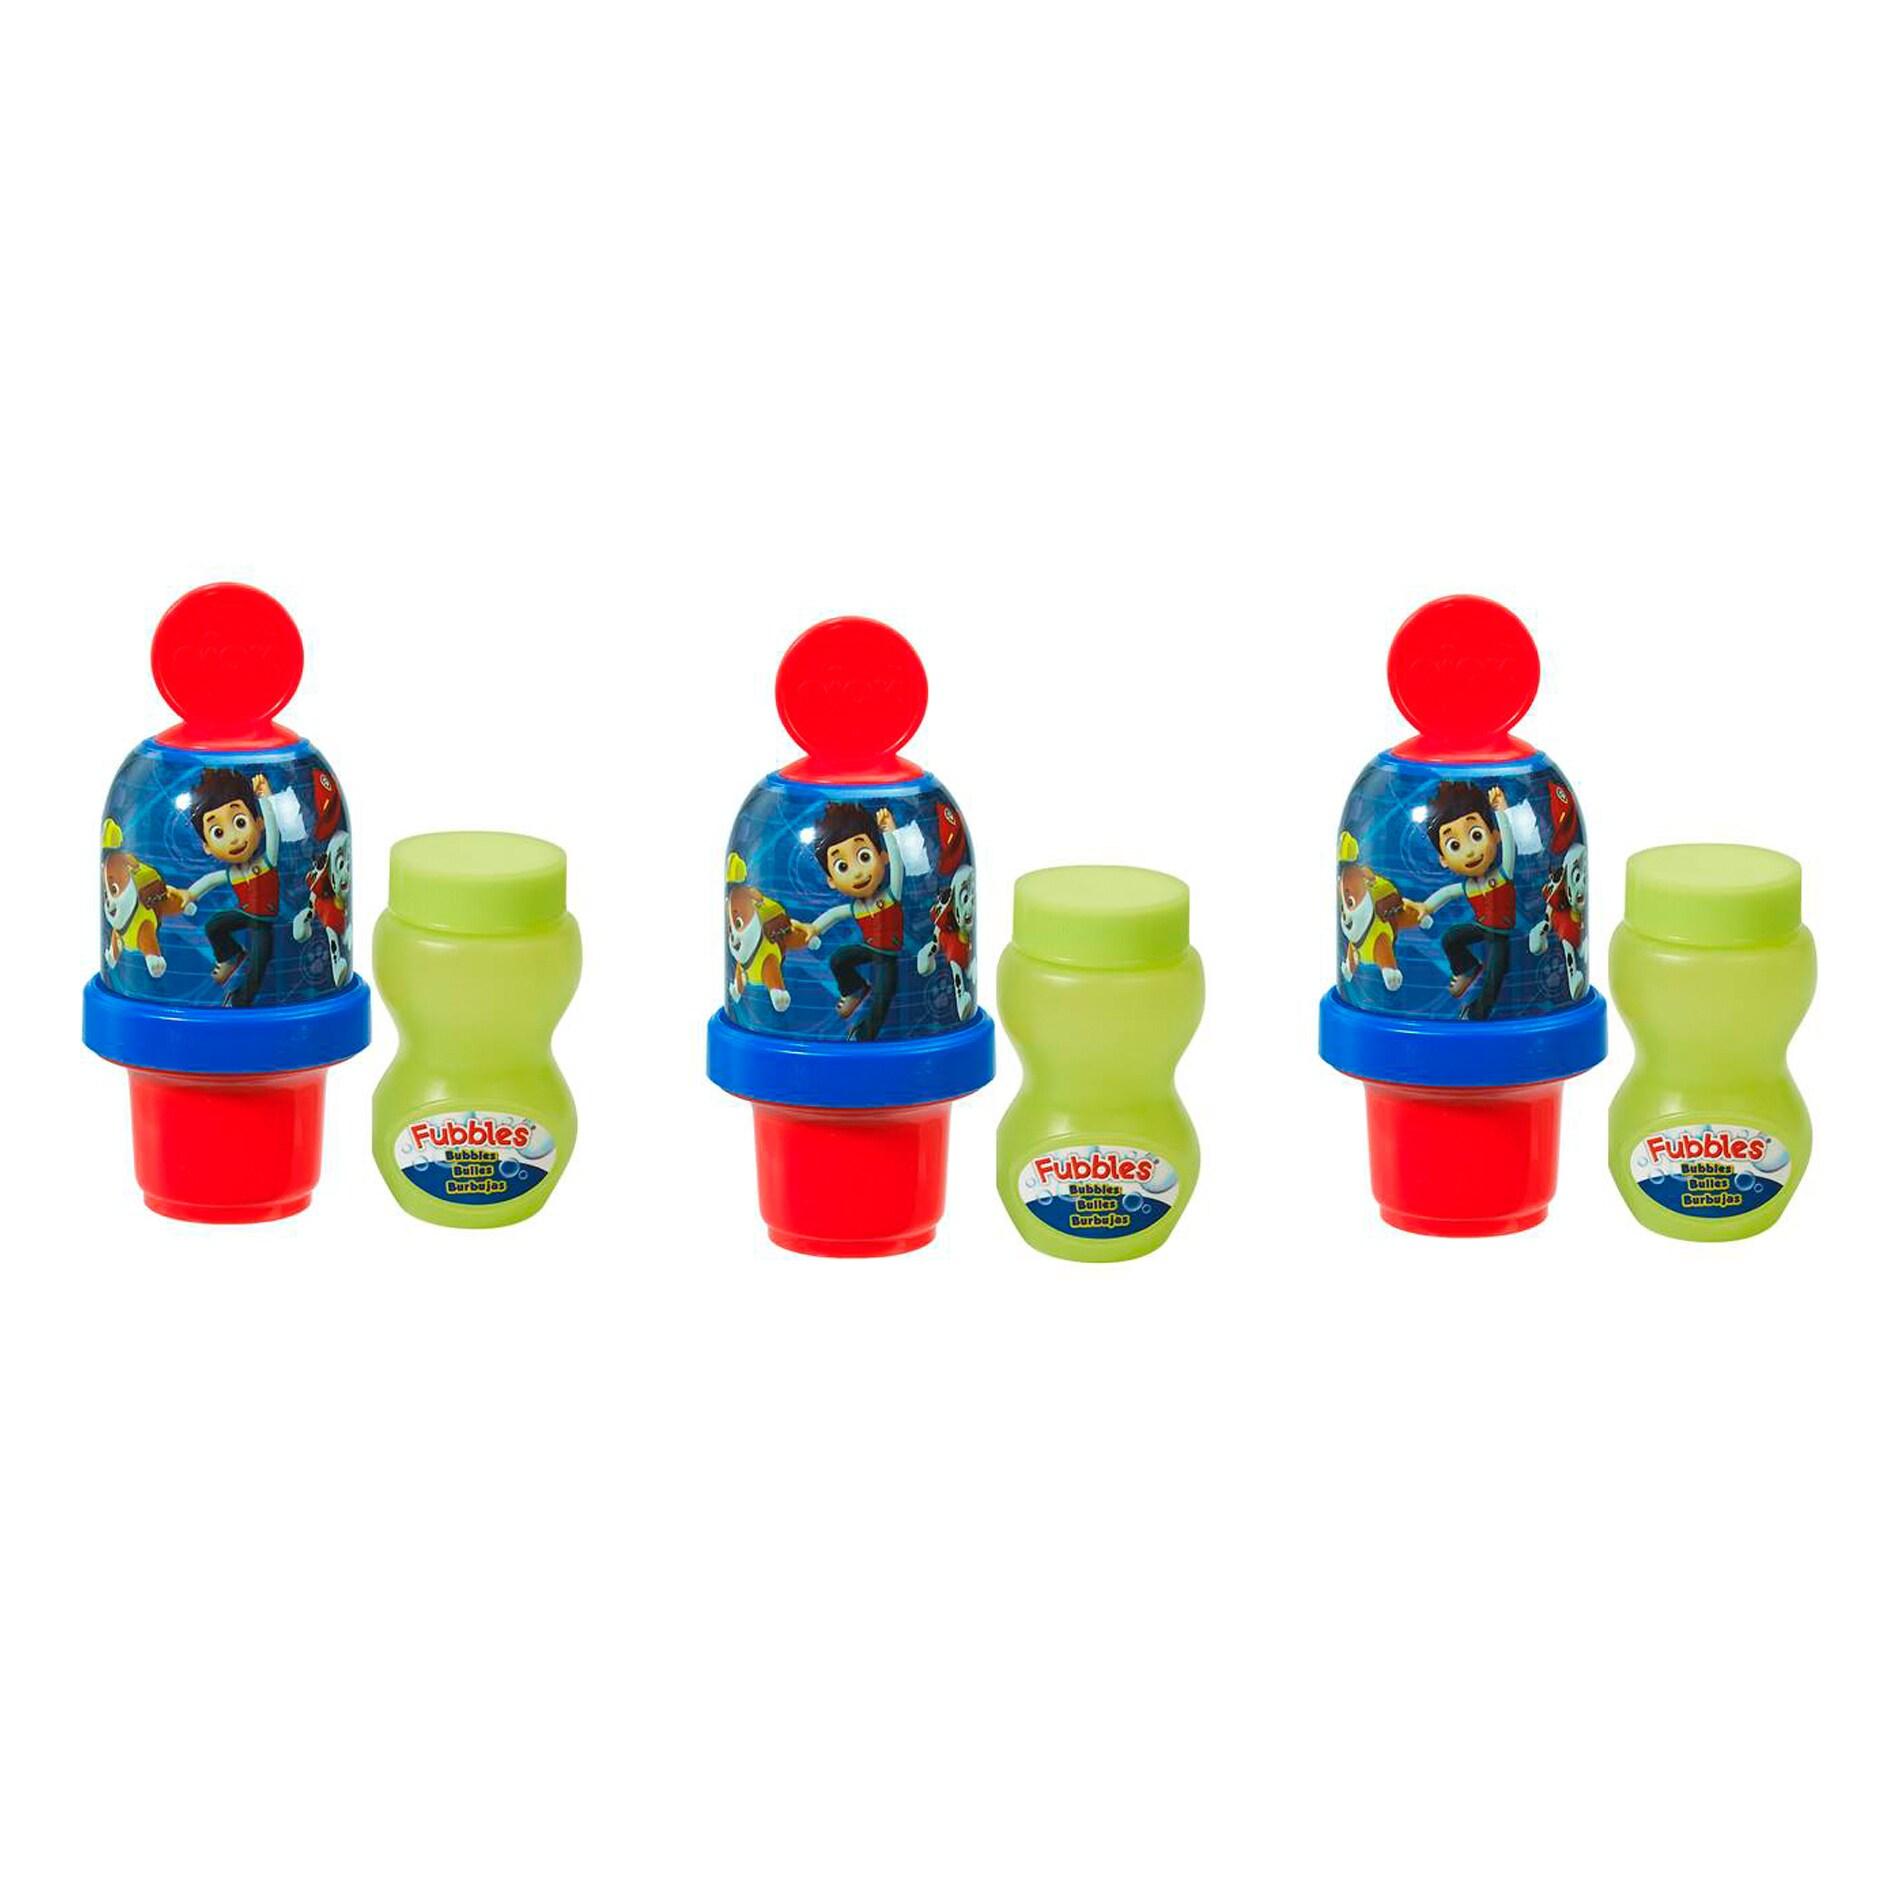 Little Kids Paw Patrol Boy Mini Bubble Tumbler 3 Pack (1)...